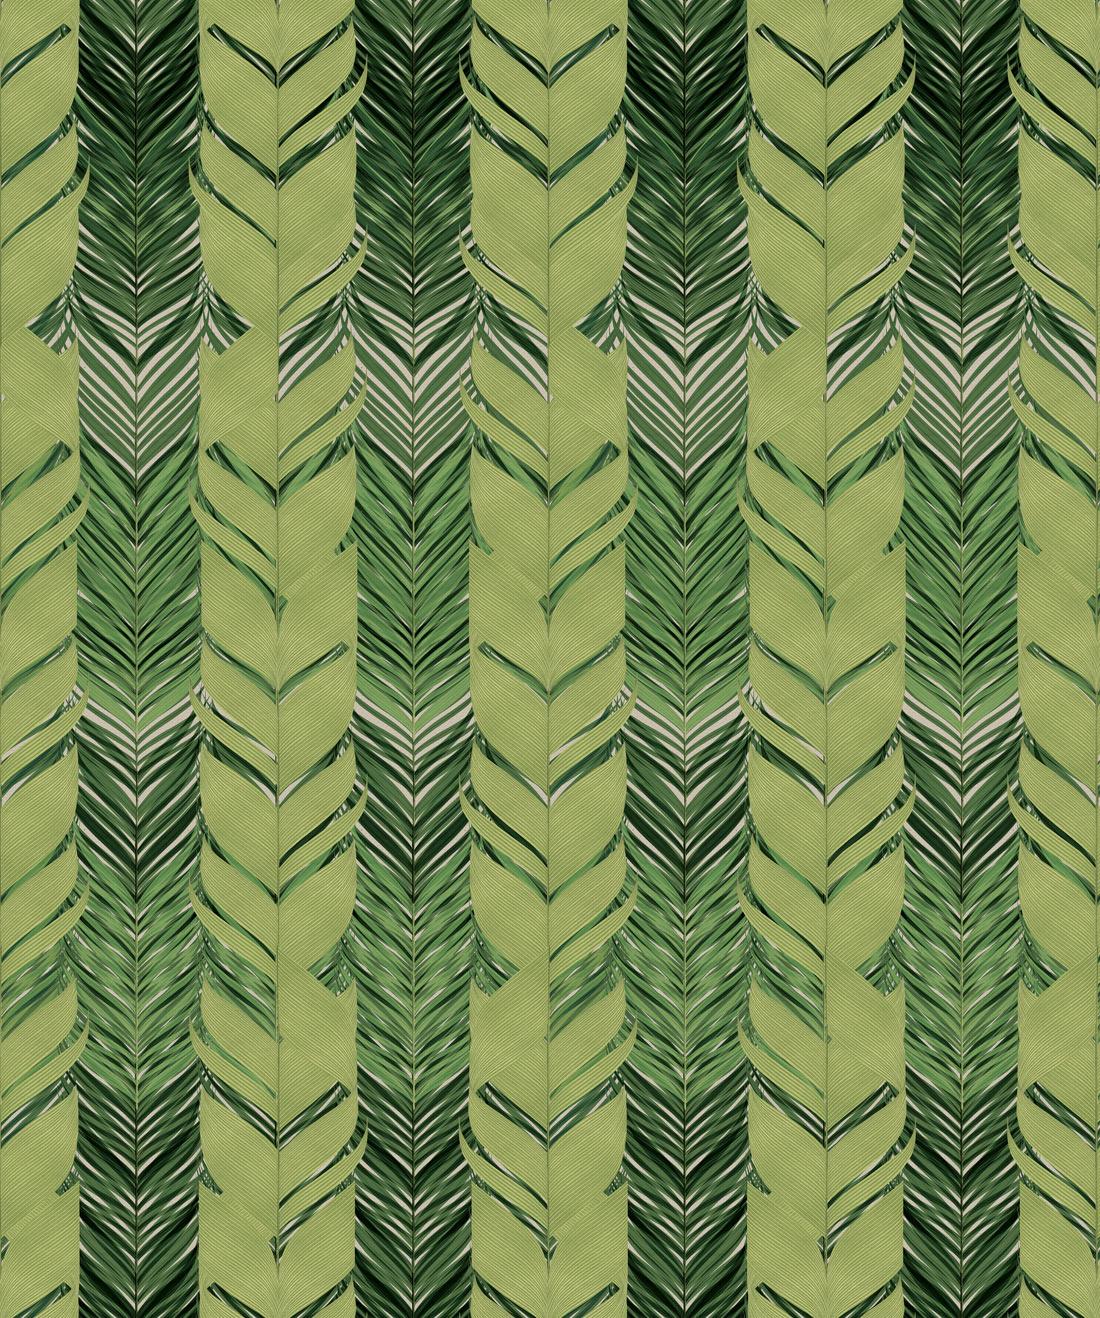 Jungle Weave Wallpaper